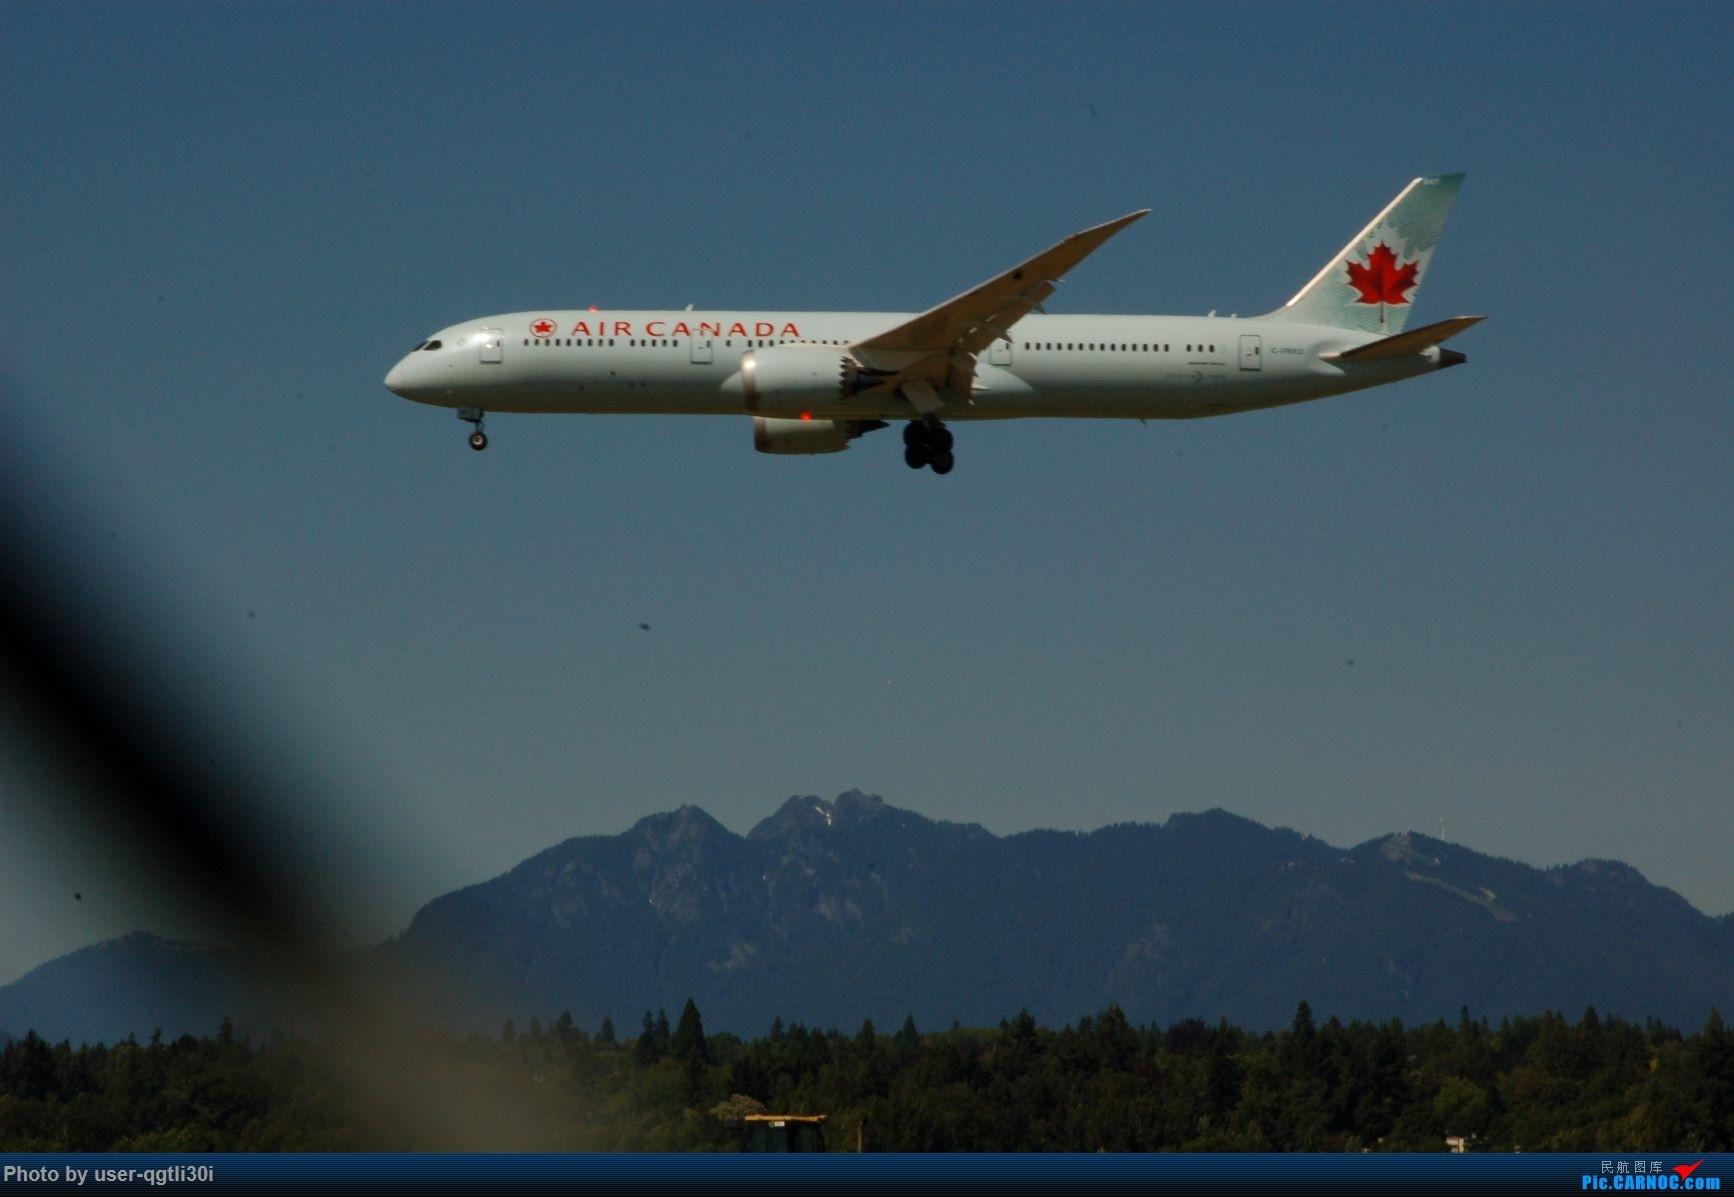 Re:NKG-HKG-YVR BOEING 787-9 C-FRSO YVR